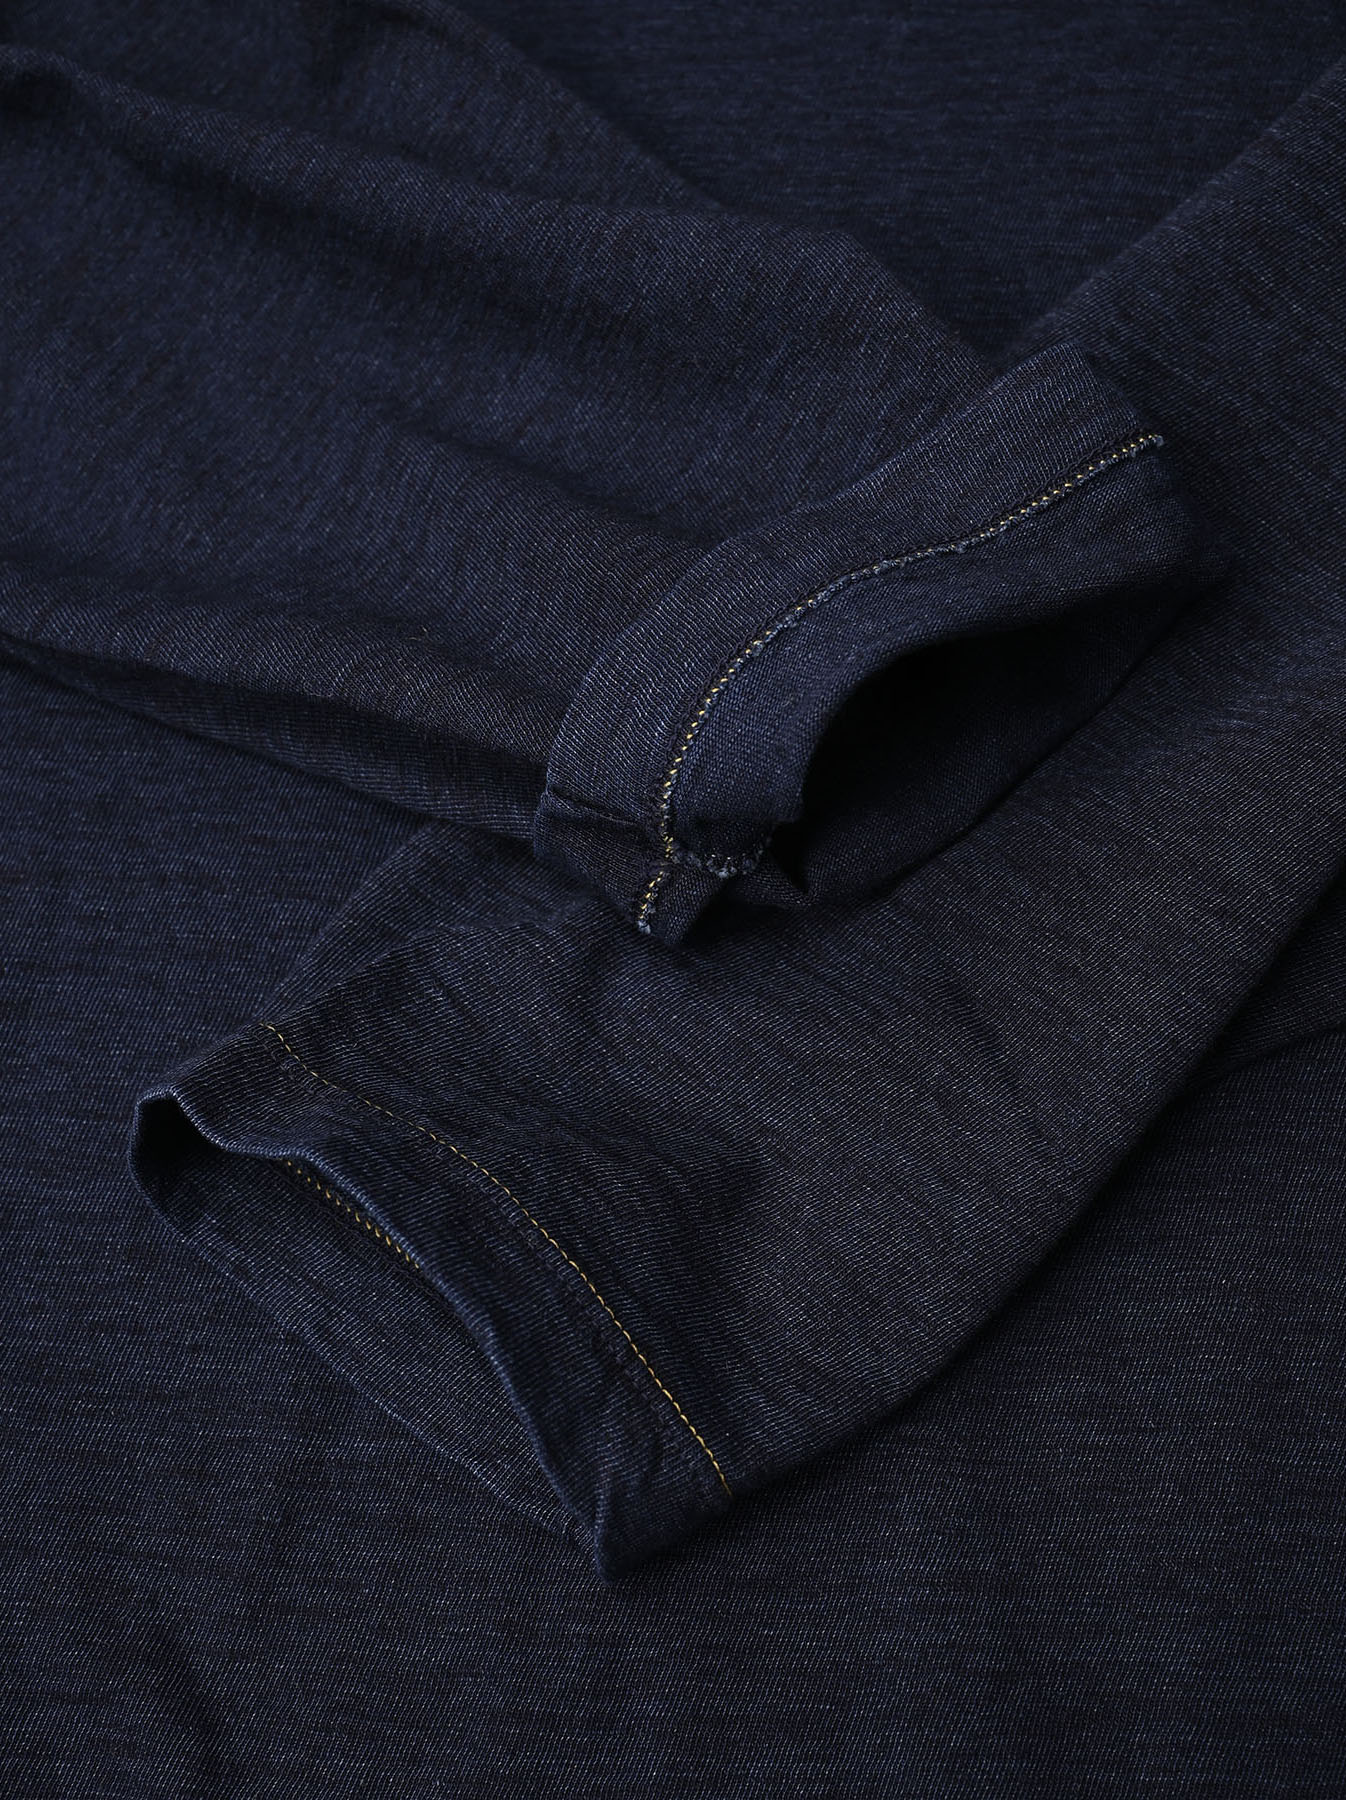 Indigo Zimbabwe 908 Ocean T-shirt-10